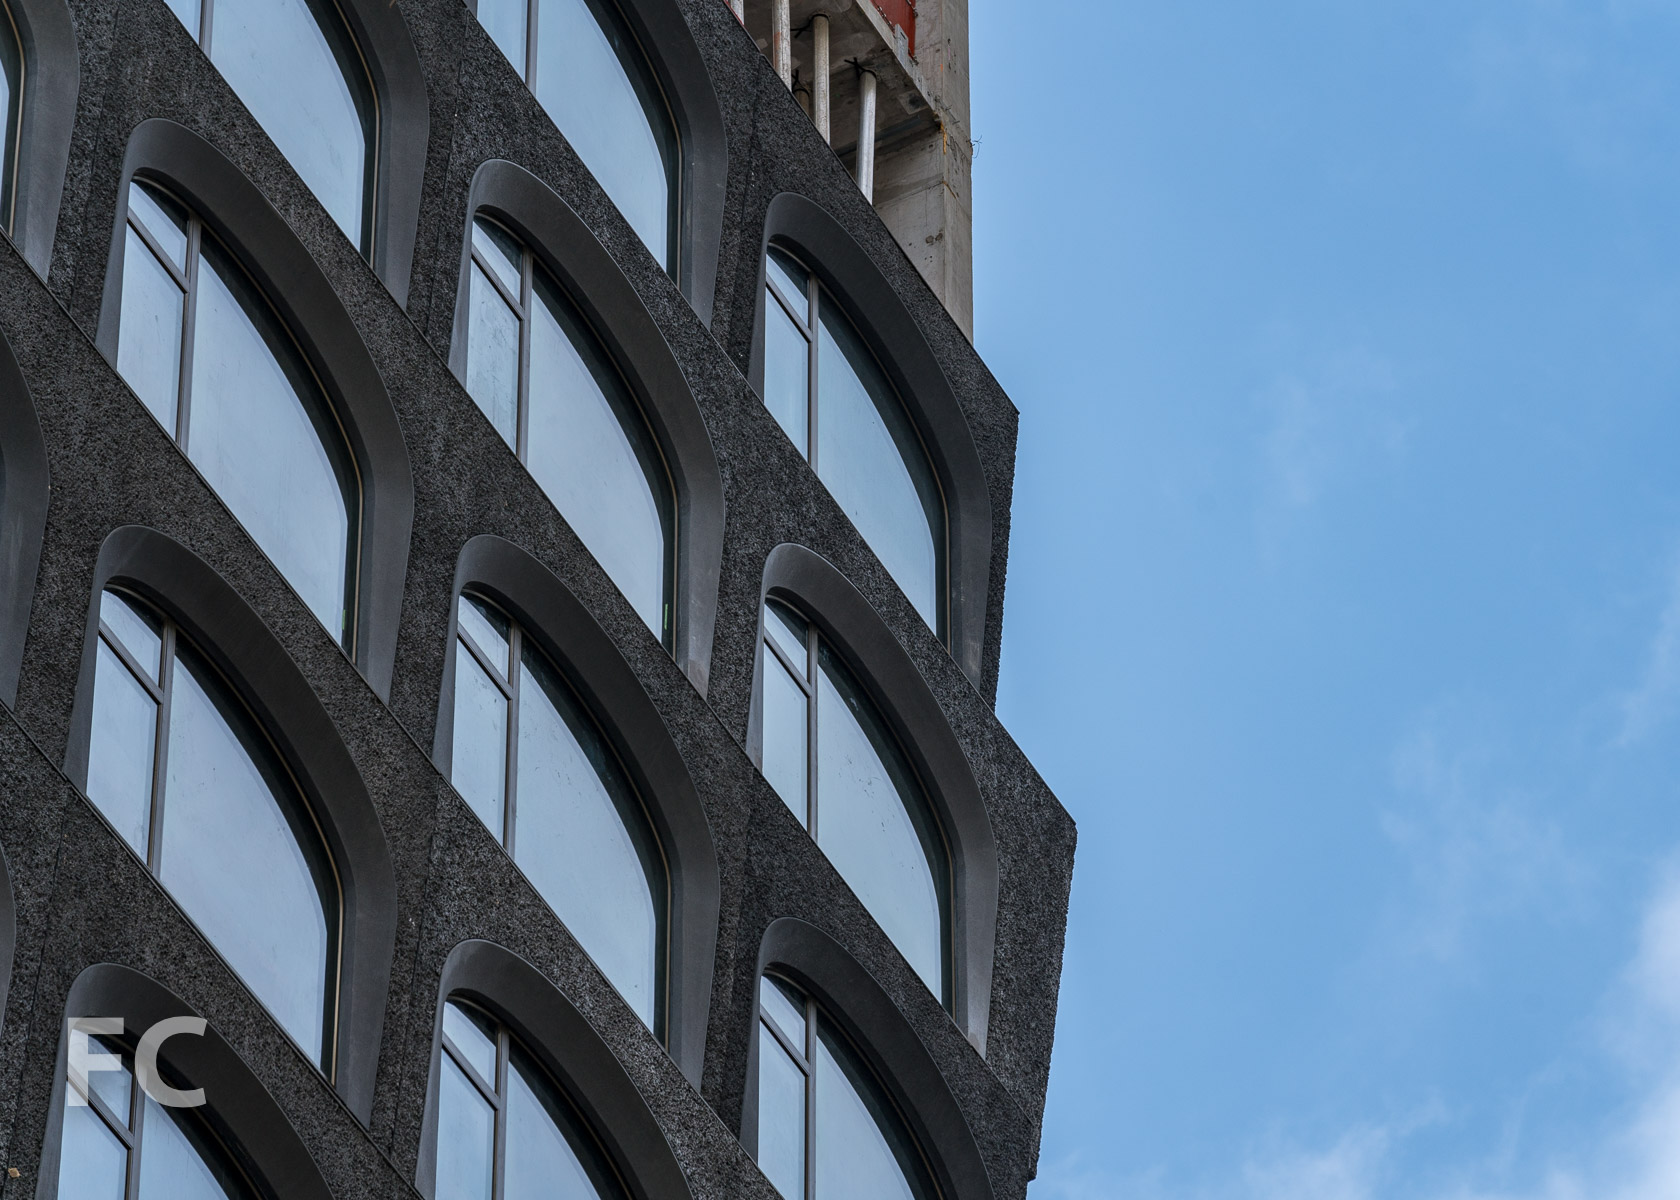 Closeup of the north facade panels.